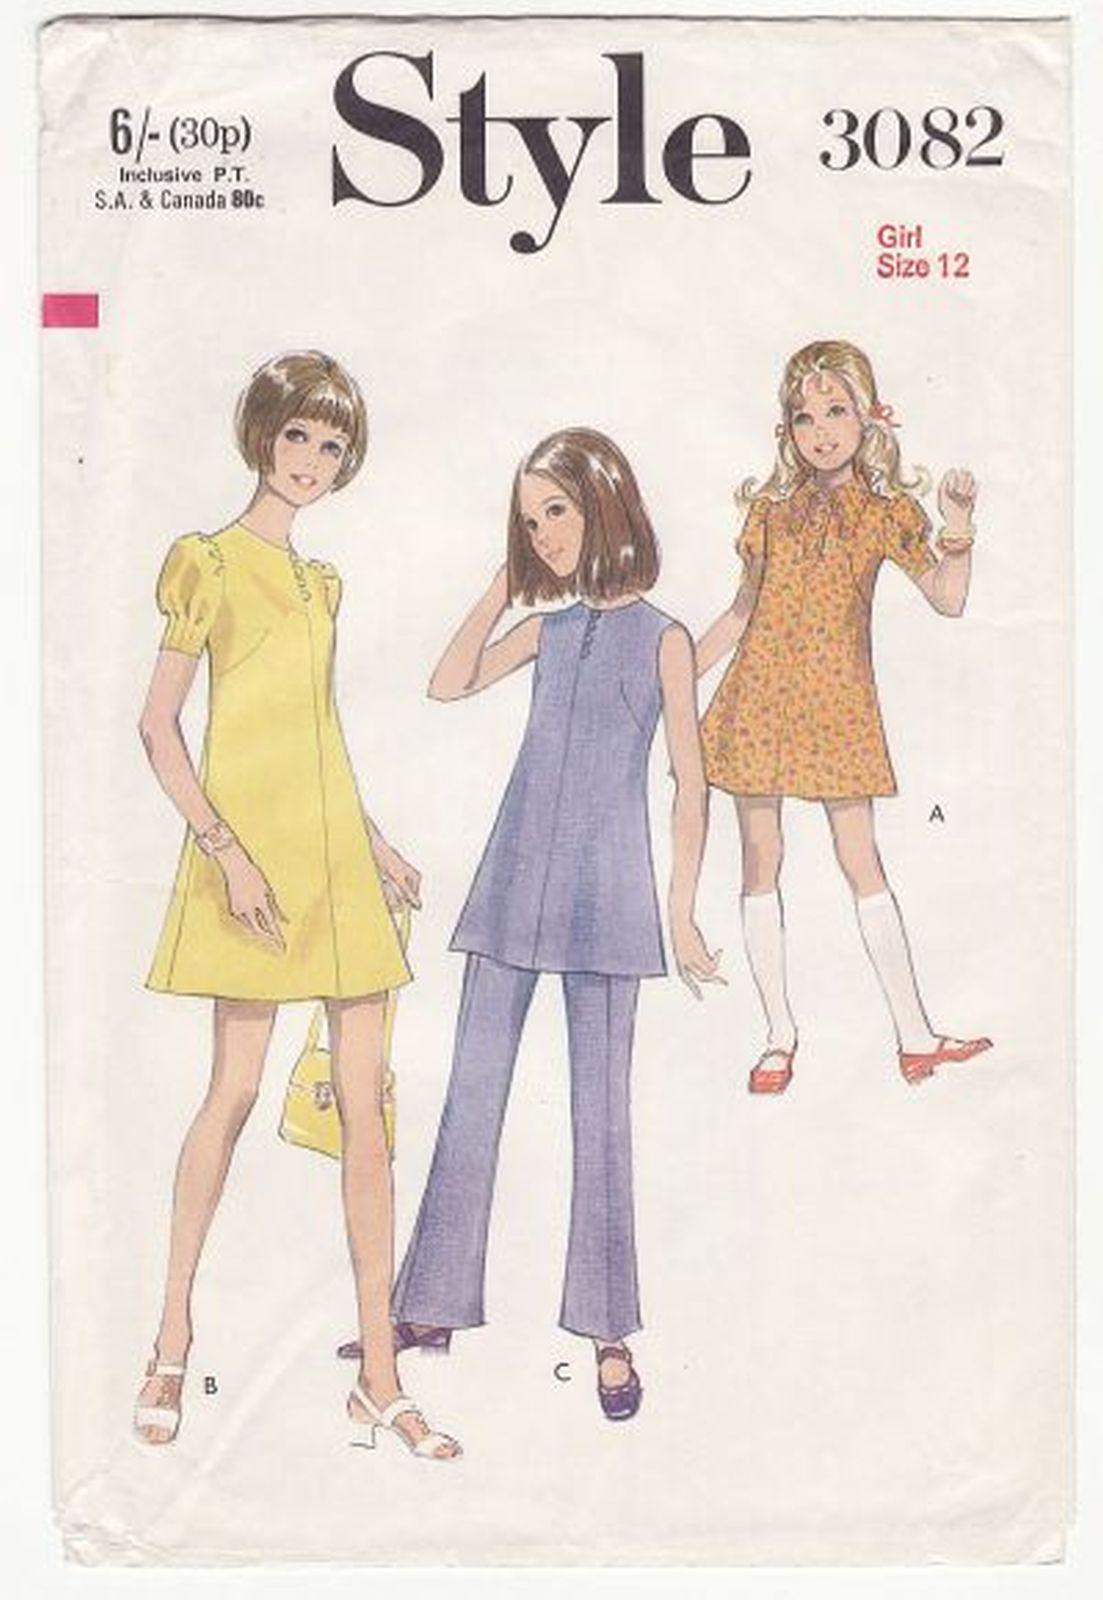 Vintage 1970 Girls Style Dress Tunic Trousers Pants Sew Pattern S12